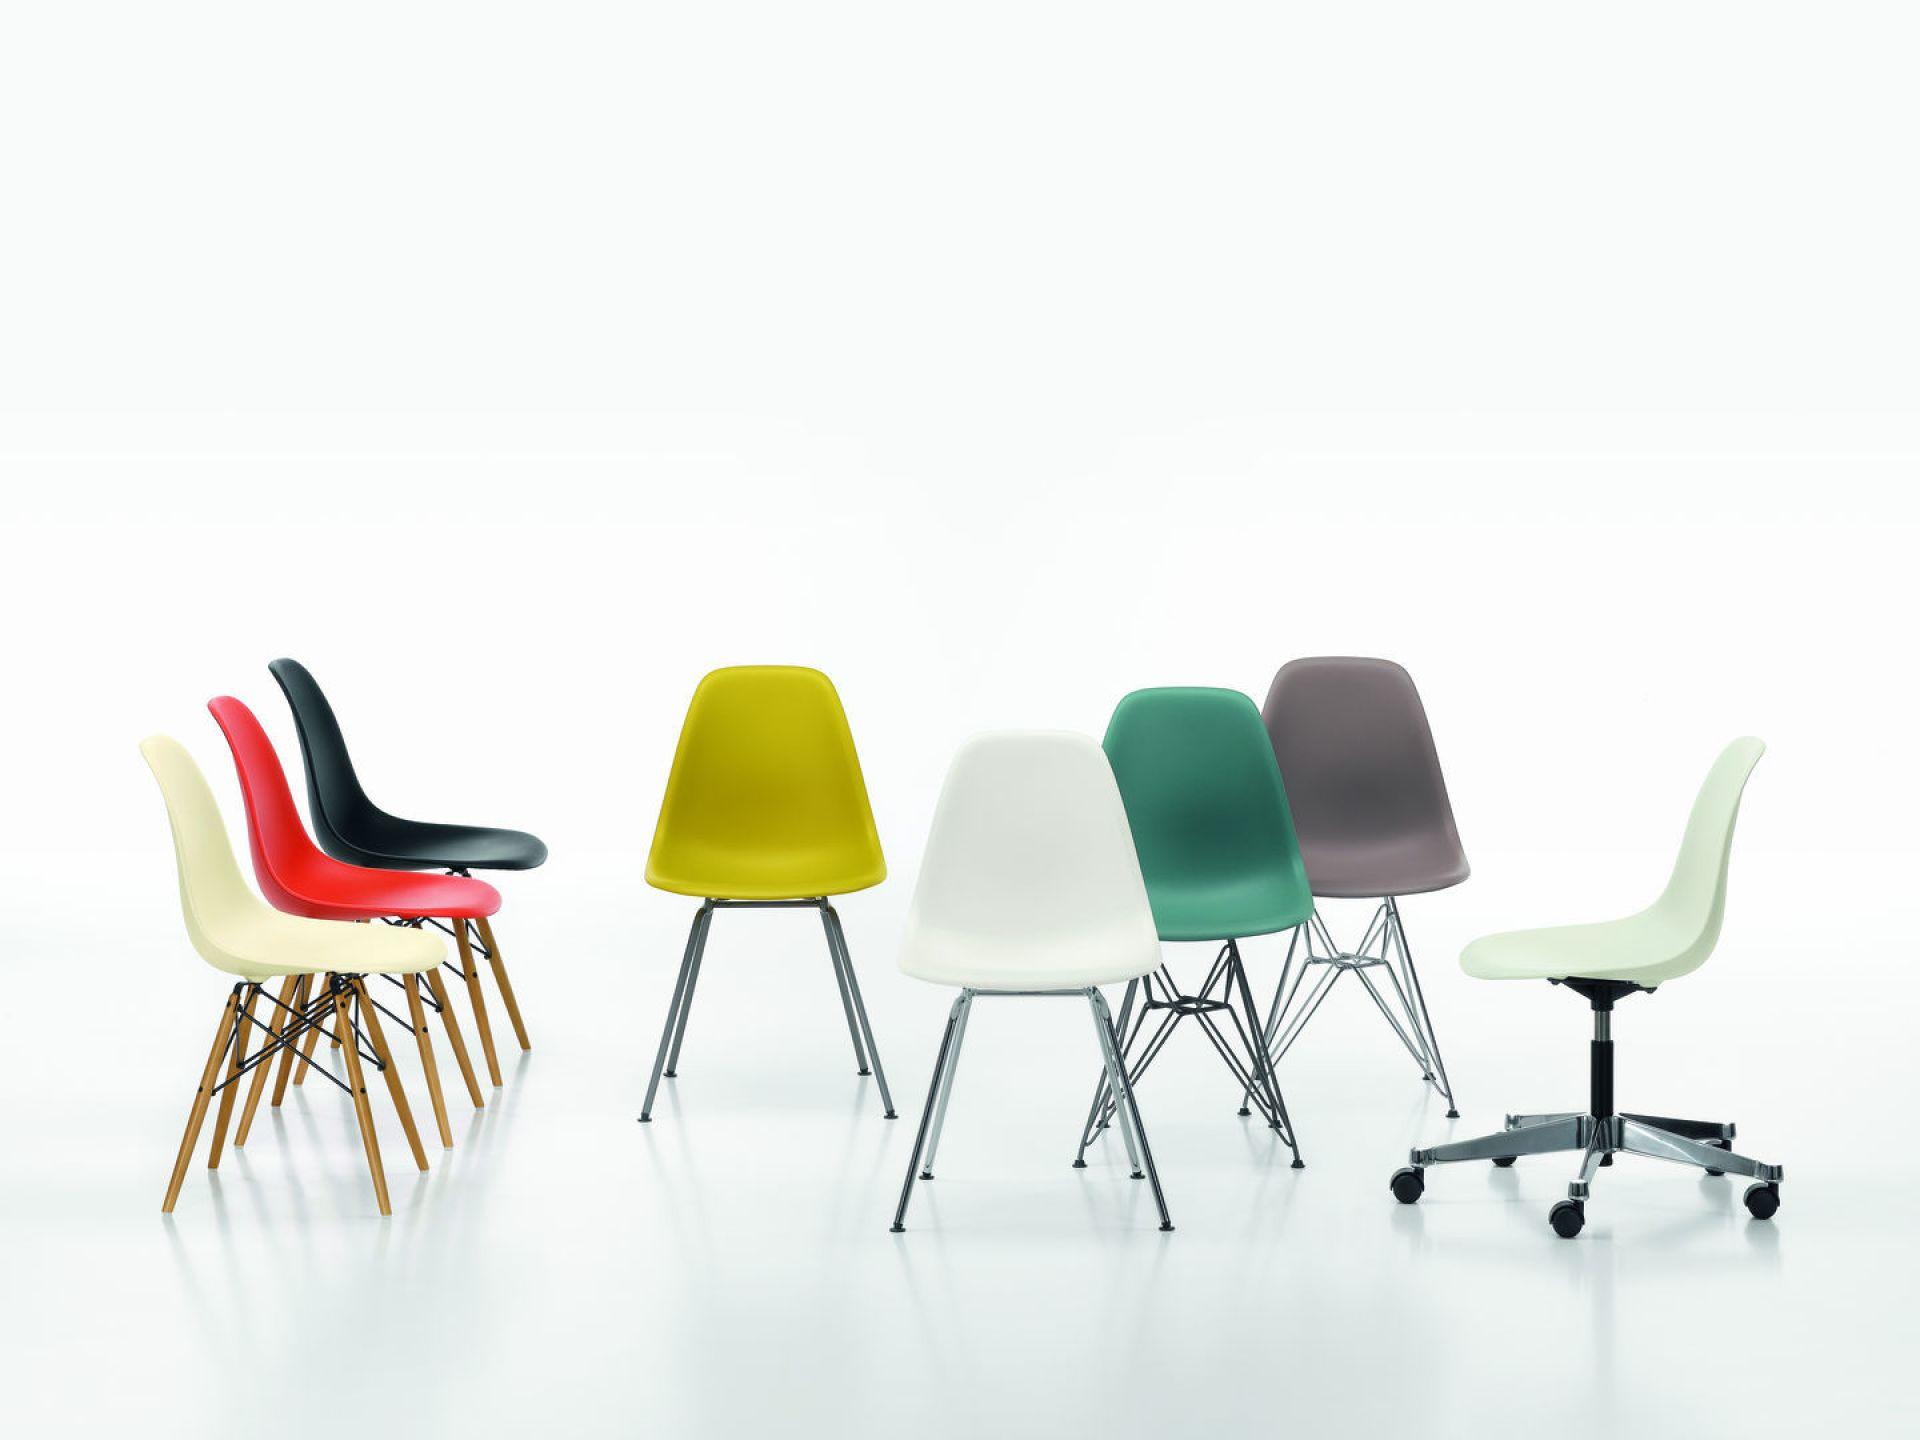 Eames Plastic Side Chair PSCC Drehstuhl mit Sitzpolster Vitra